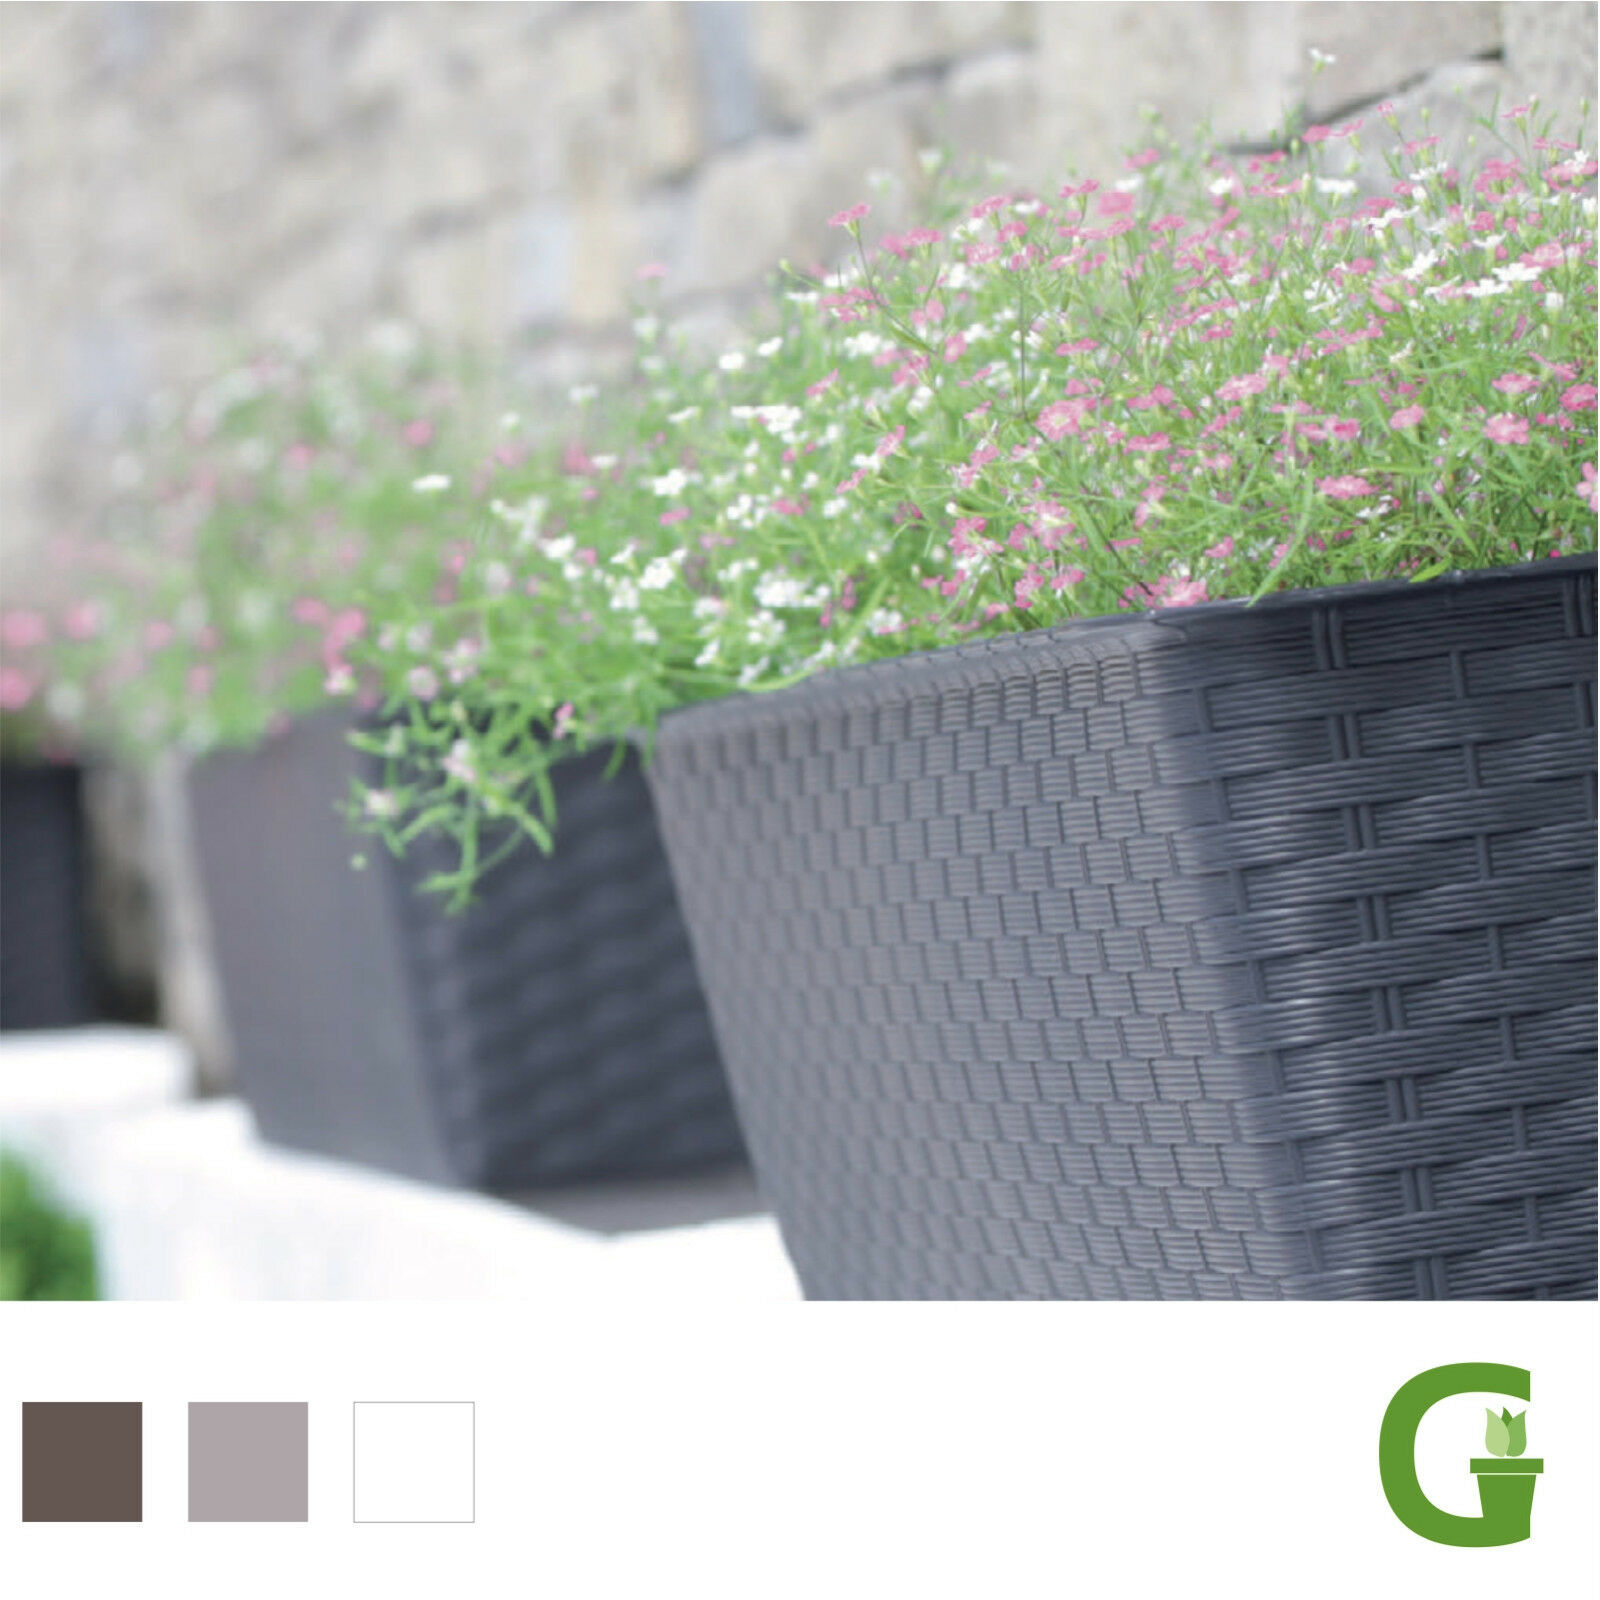 rattan lounge design blumentopf mit bew sserungssystem blumentopf blumenk bel ebay. Black Bedroom Furniture Sets. Home Design Ideas